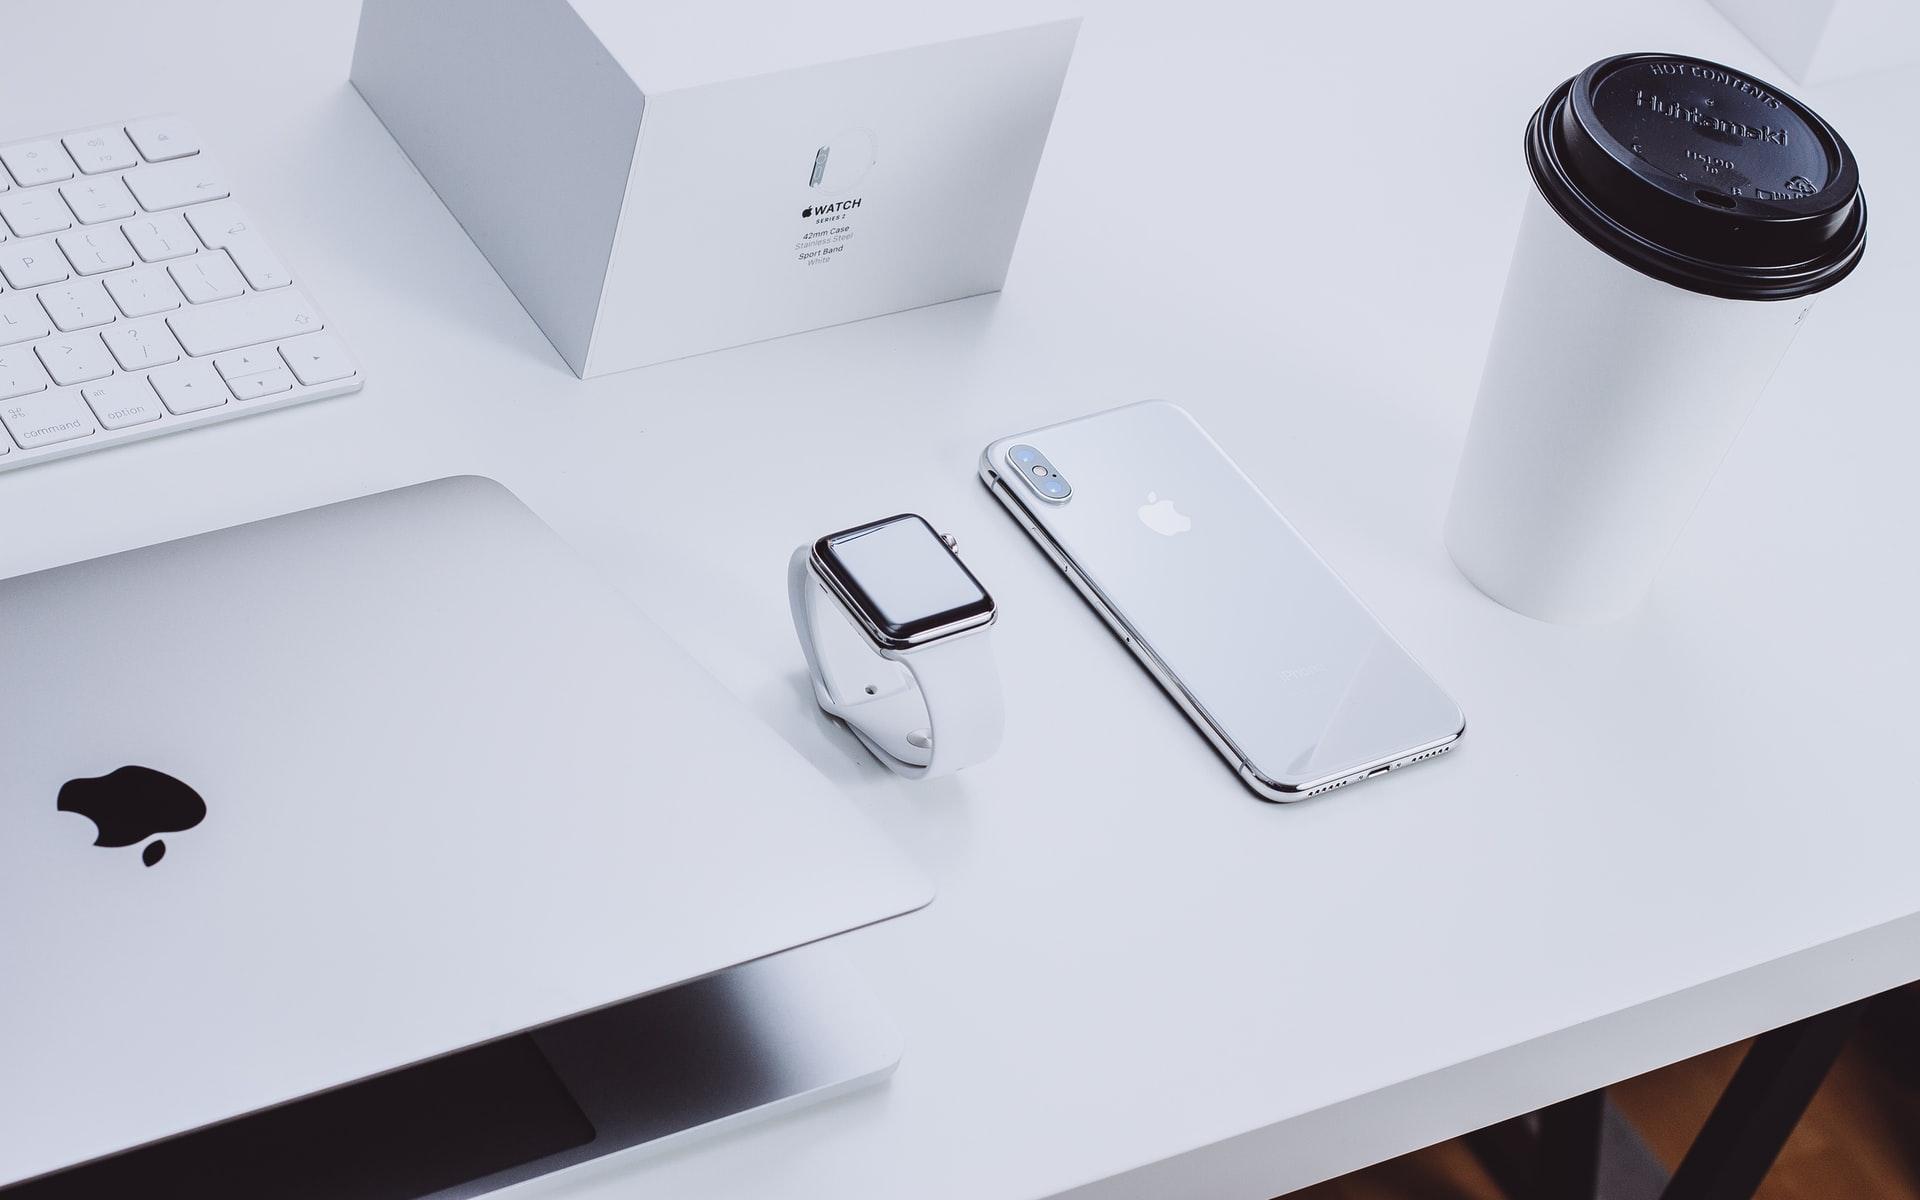 From Apple to Avon: six inspiring marketing successes